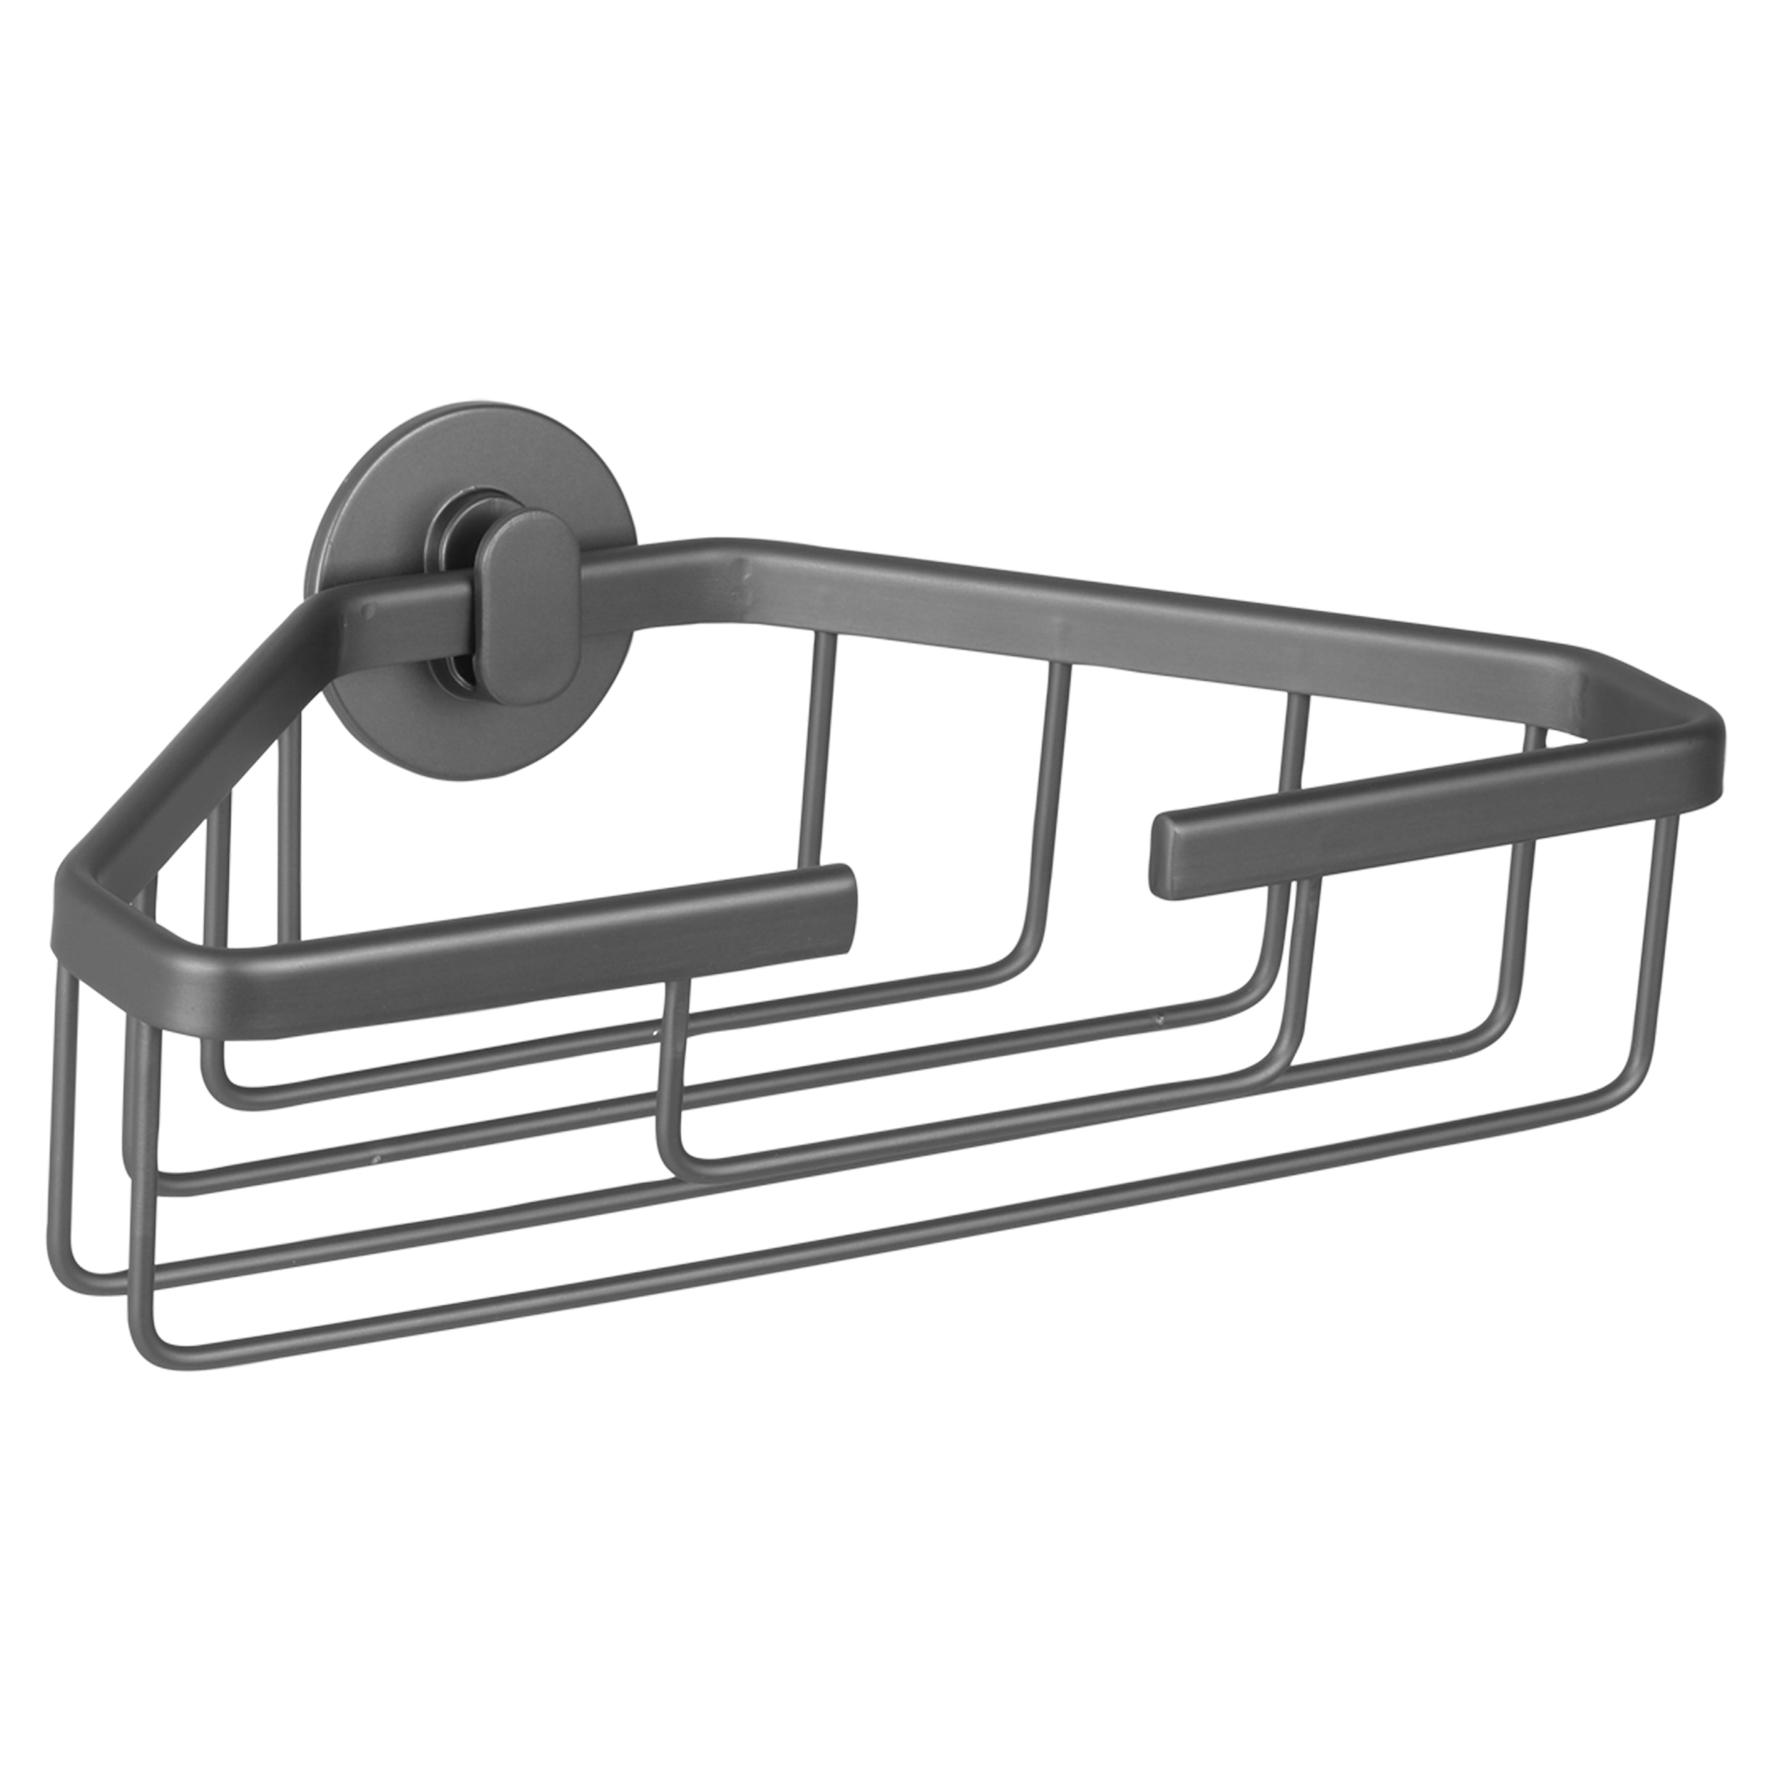 Differnz draadmand - driehoek - aluminium - gun metal